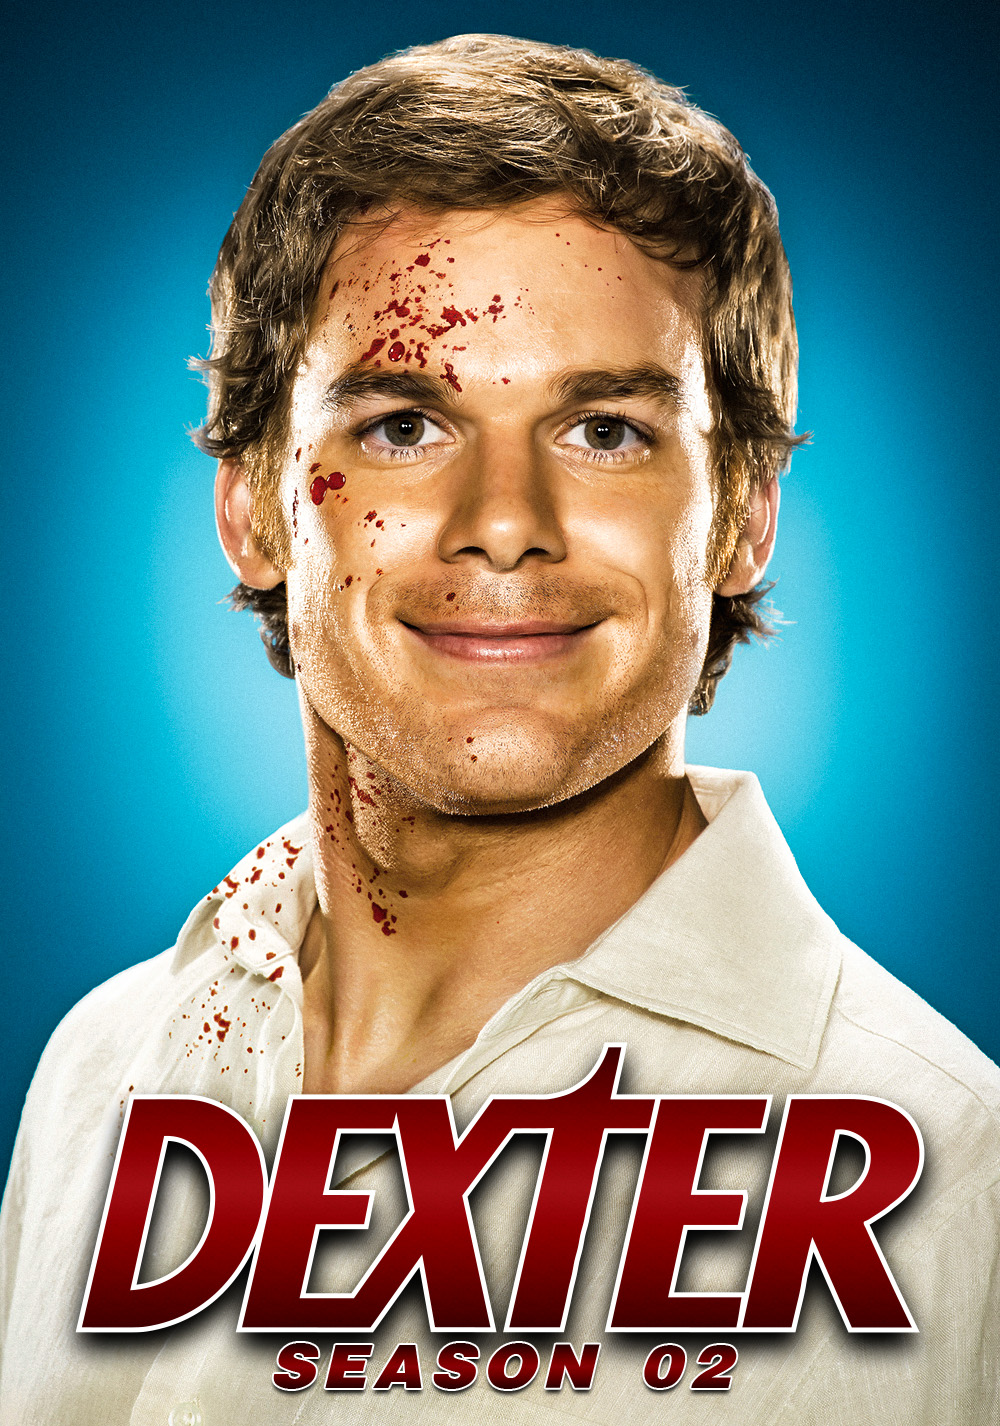 Dexter|Colección 1-8|Latino-Ingles|1080p|96/96|x265 10bit|+ Soundtracks  Season02-poster